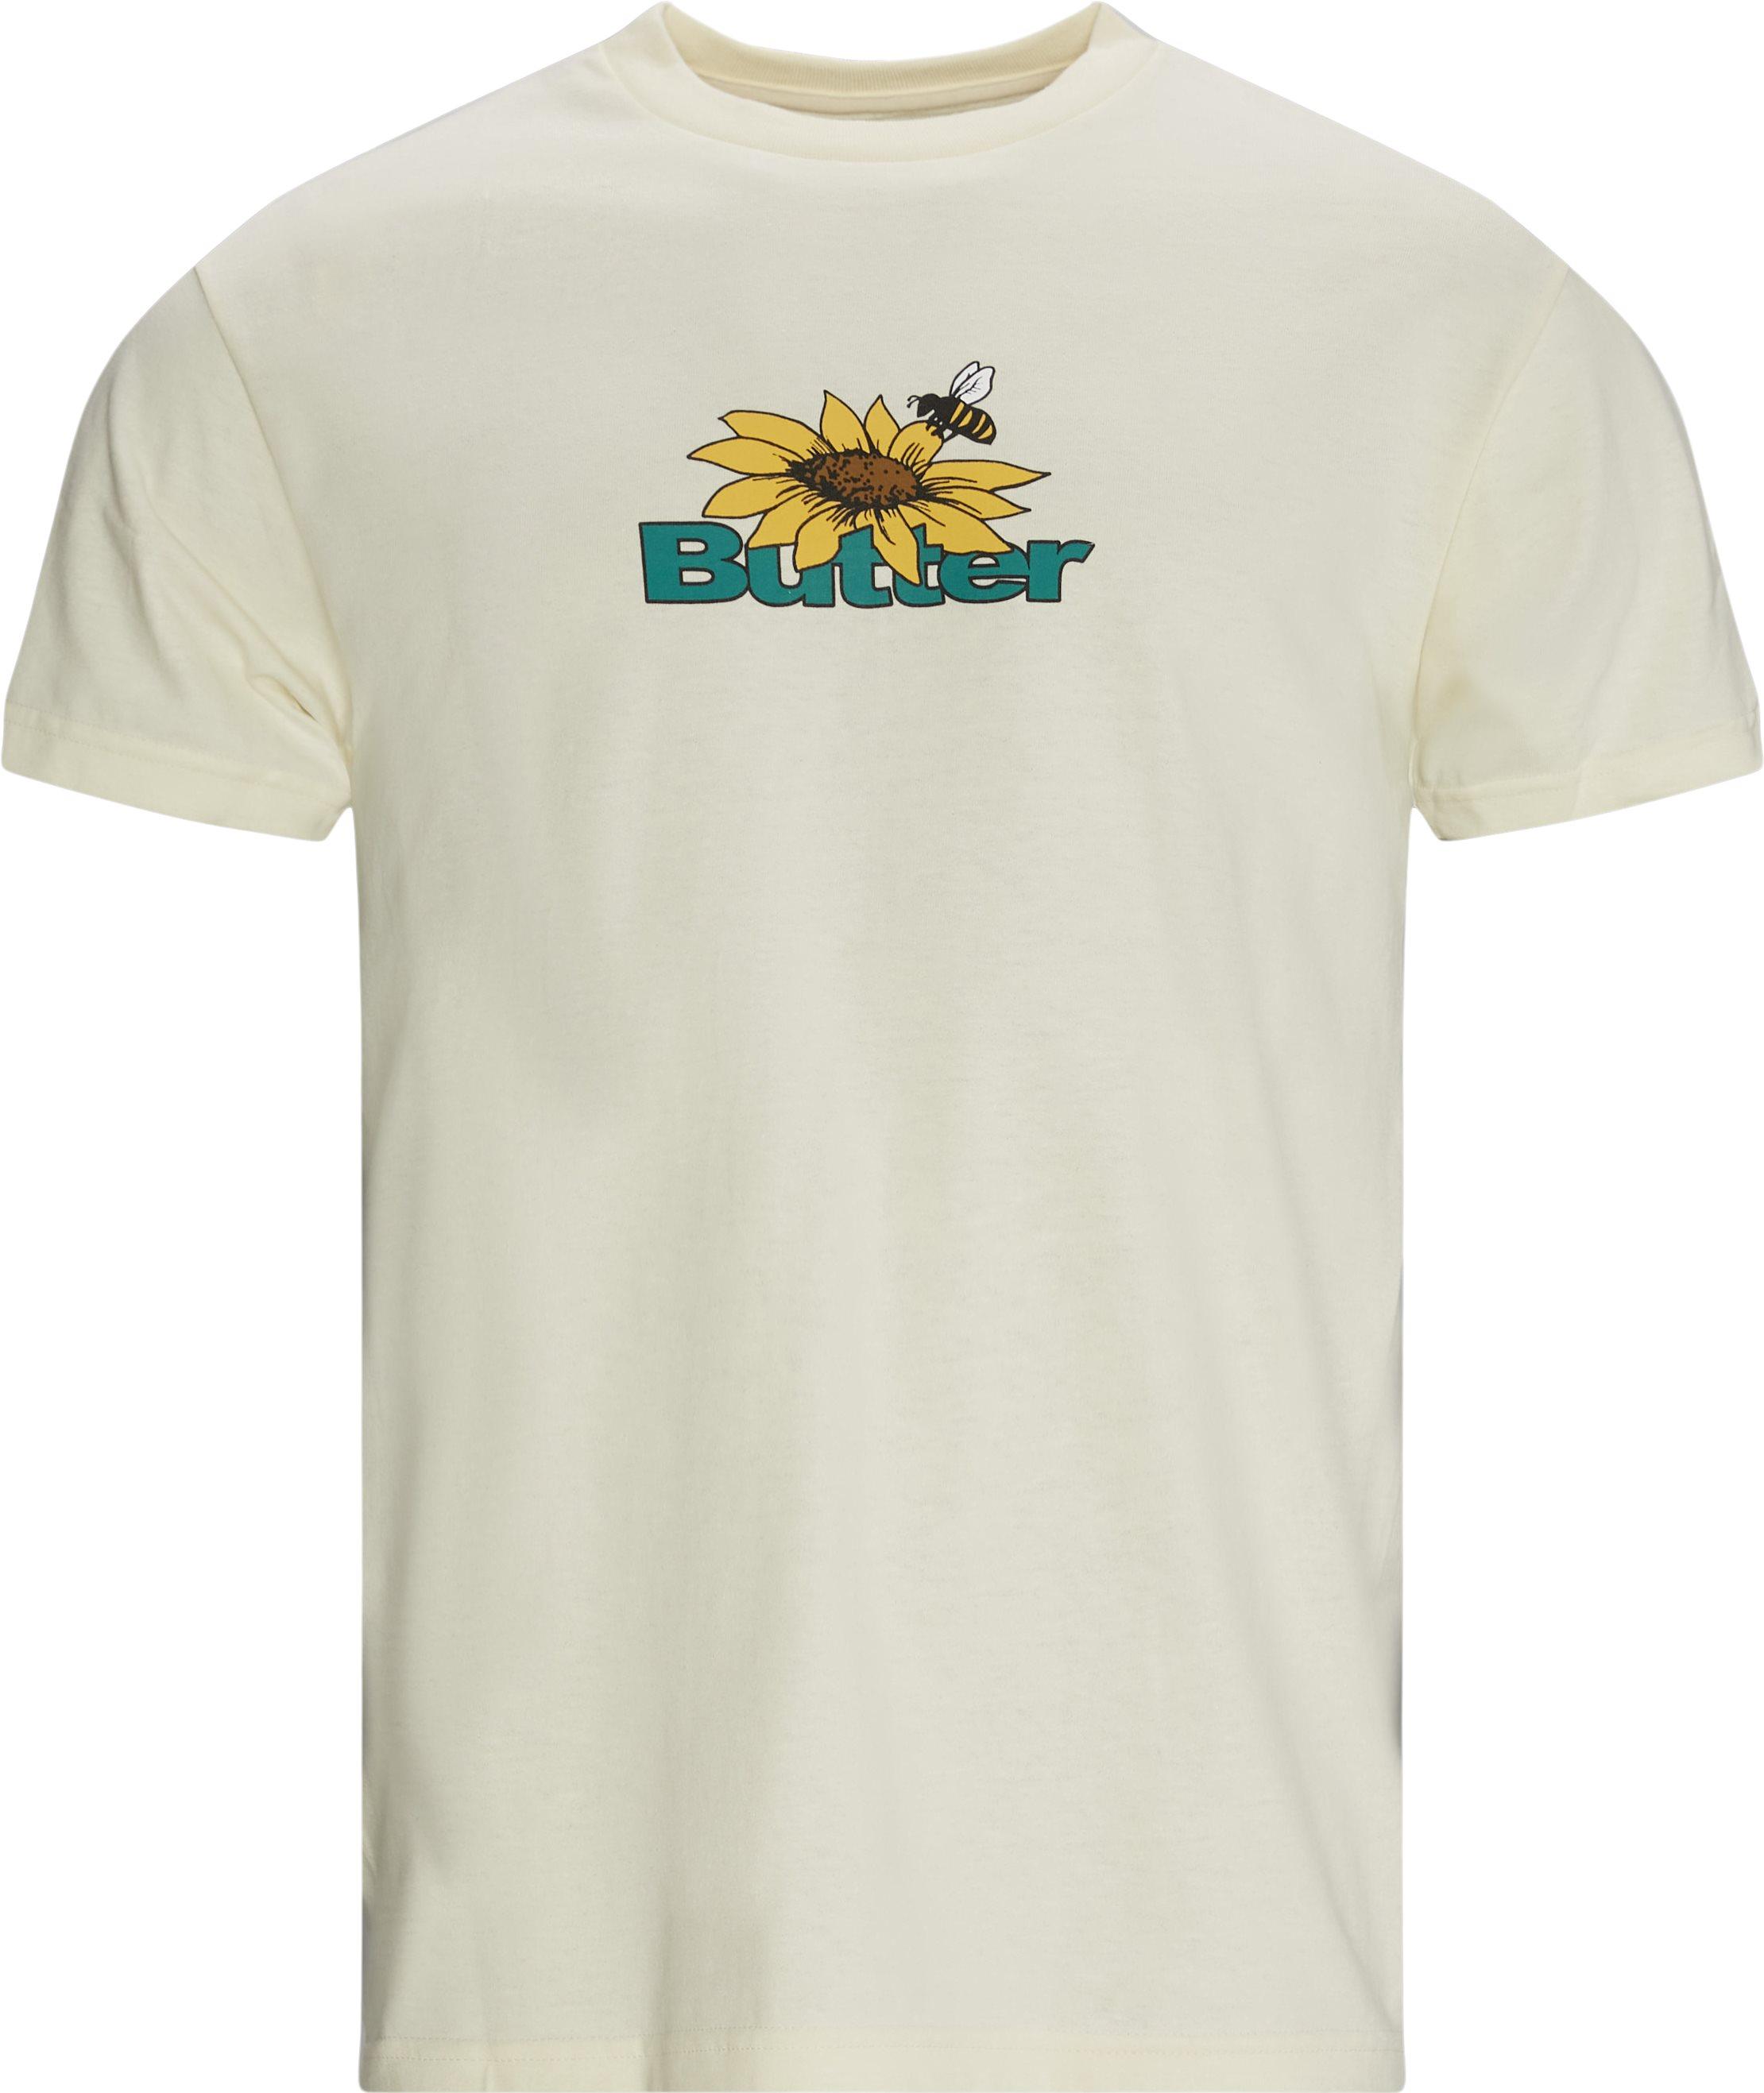 T-shirts - Regular fit - Sand